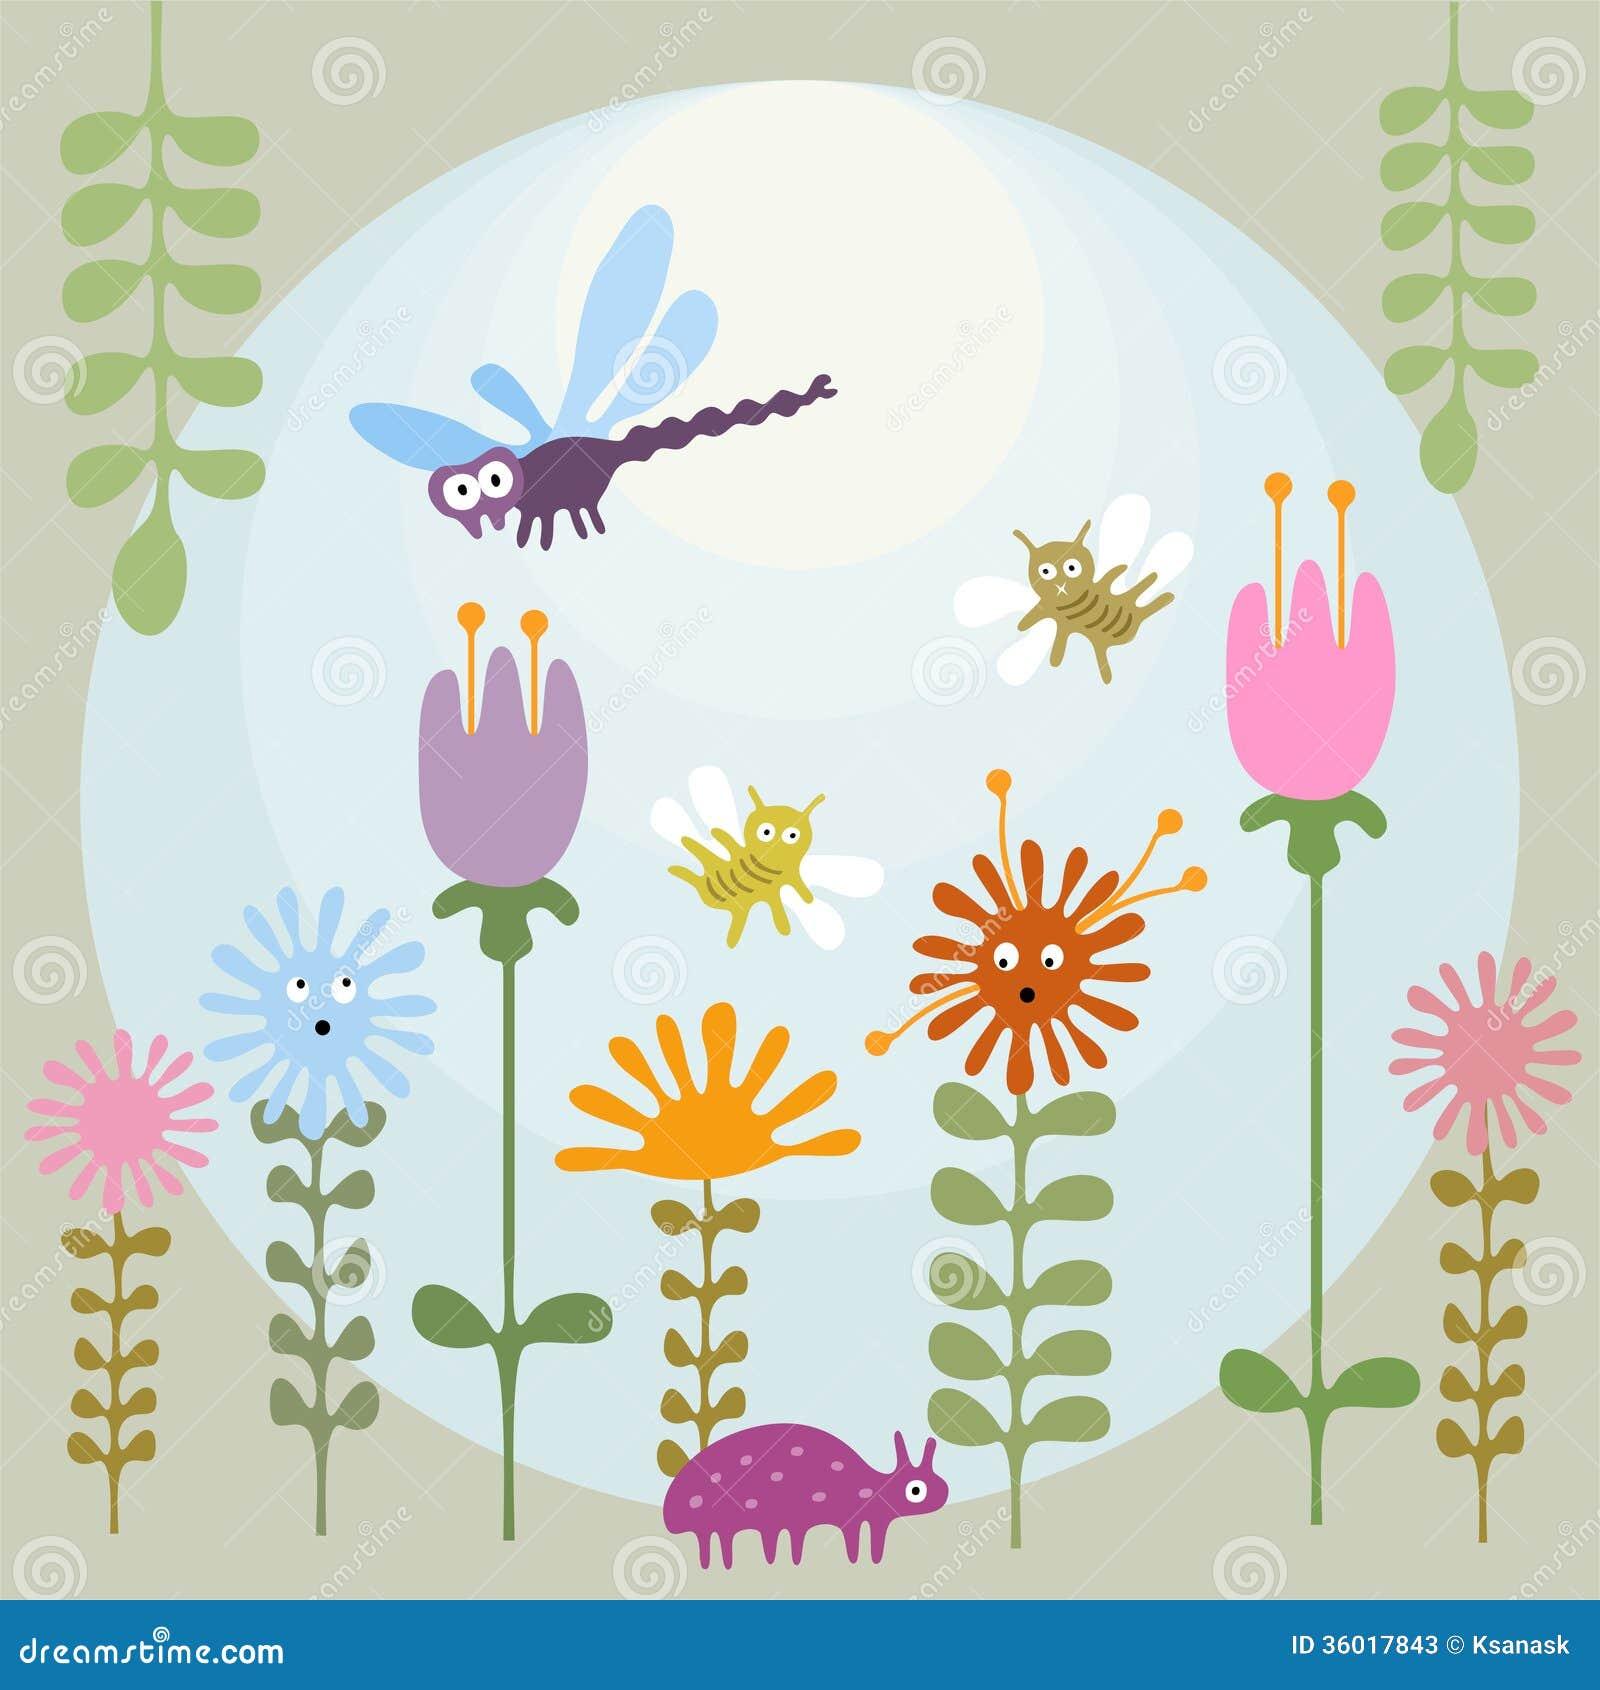 Garden Cute Cartoon: Insects In Flower Garden Stock Photos